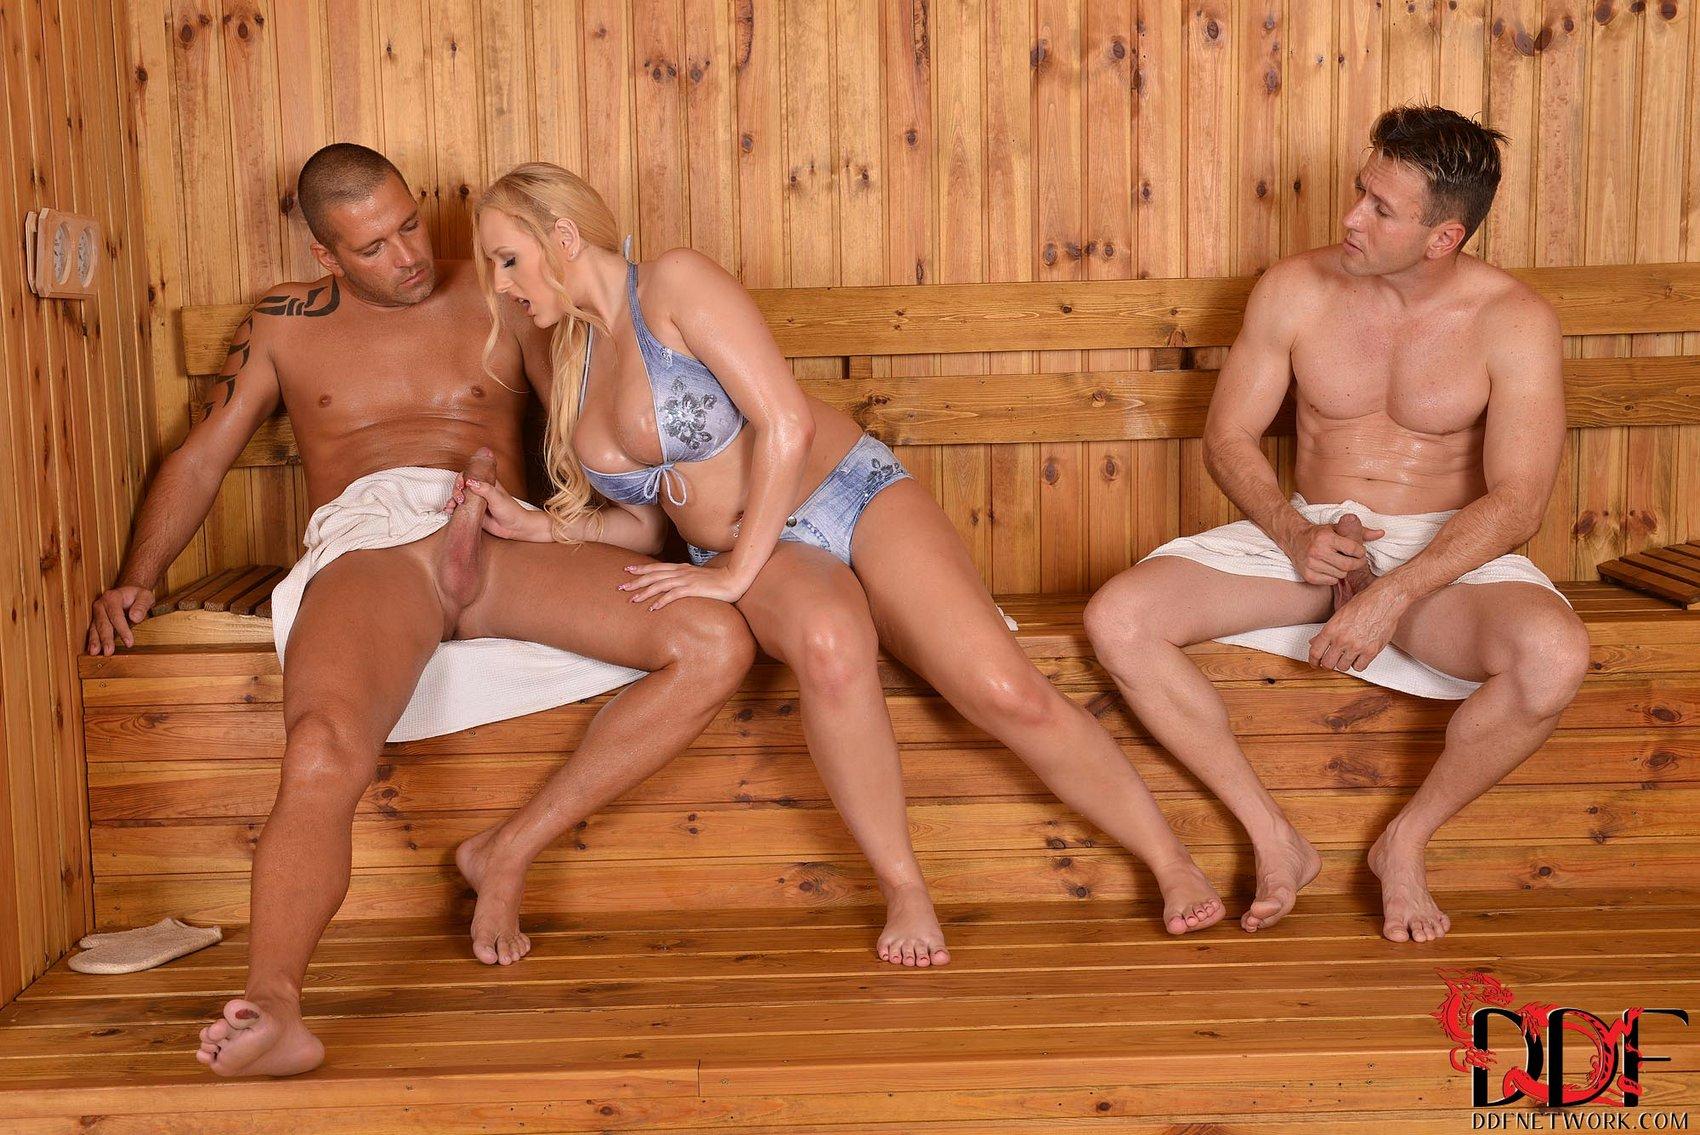 Sex porn in the sauna online